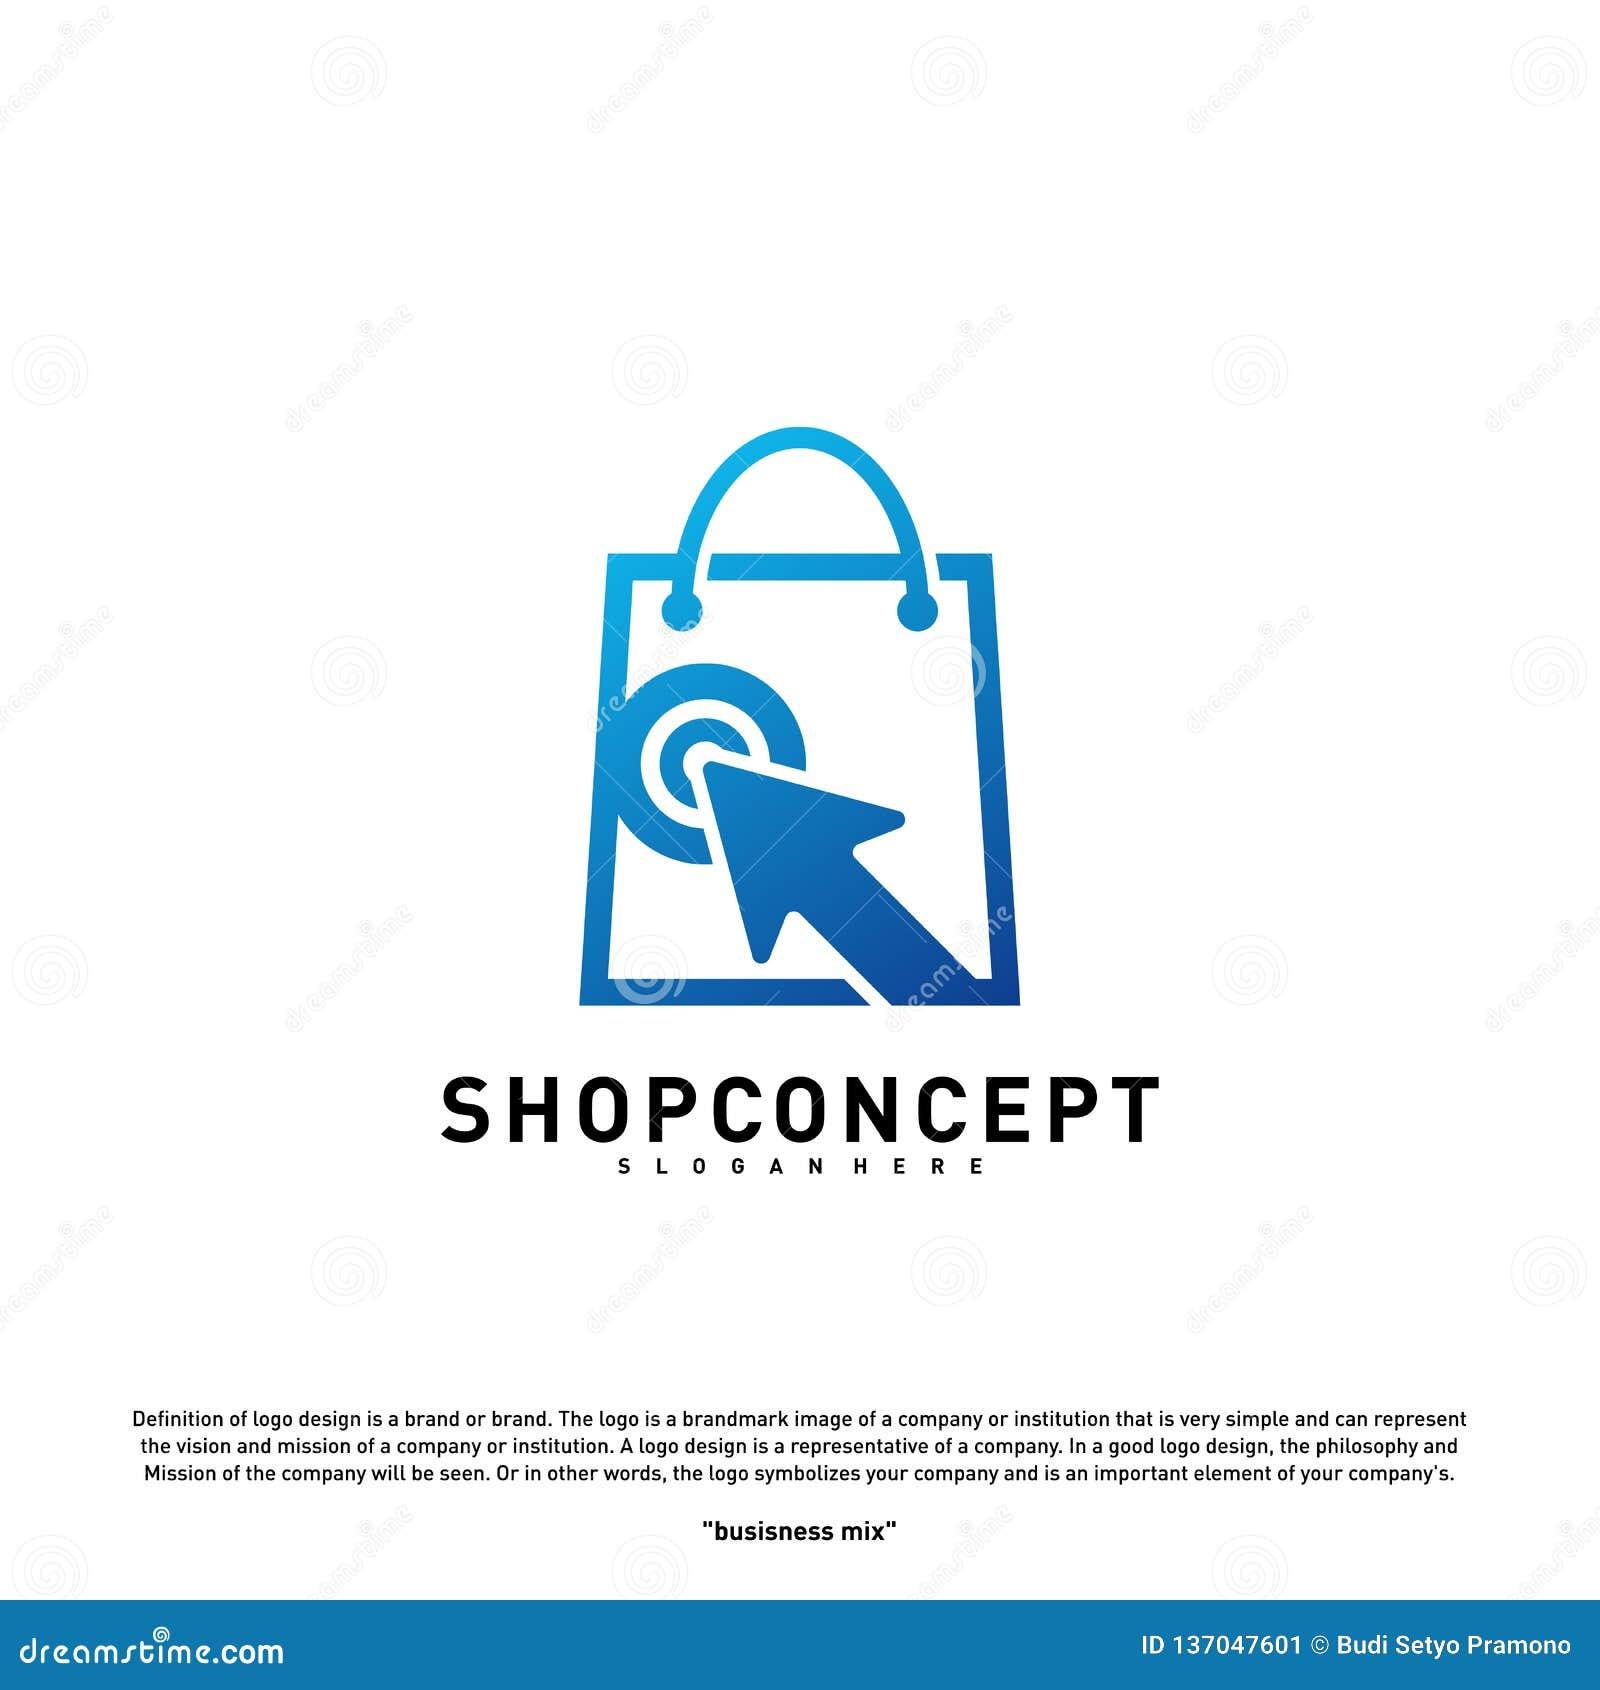 Online Shop Logo Design Concept. Online Shopping center Logo Vector. Online Store and gifts symbol